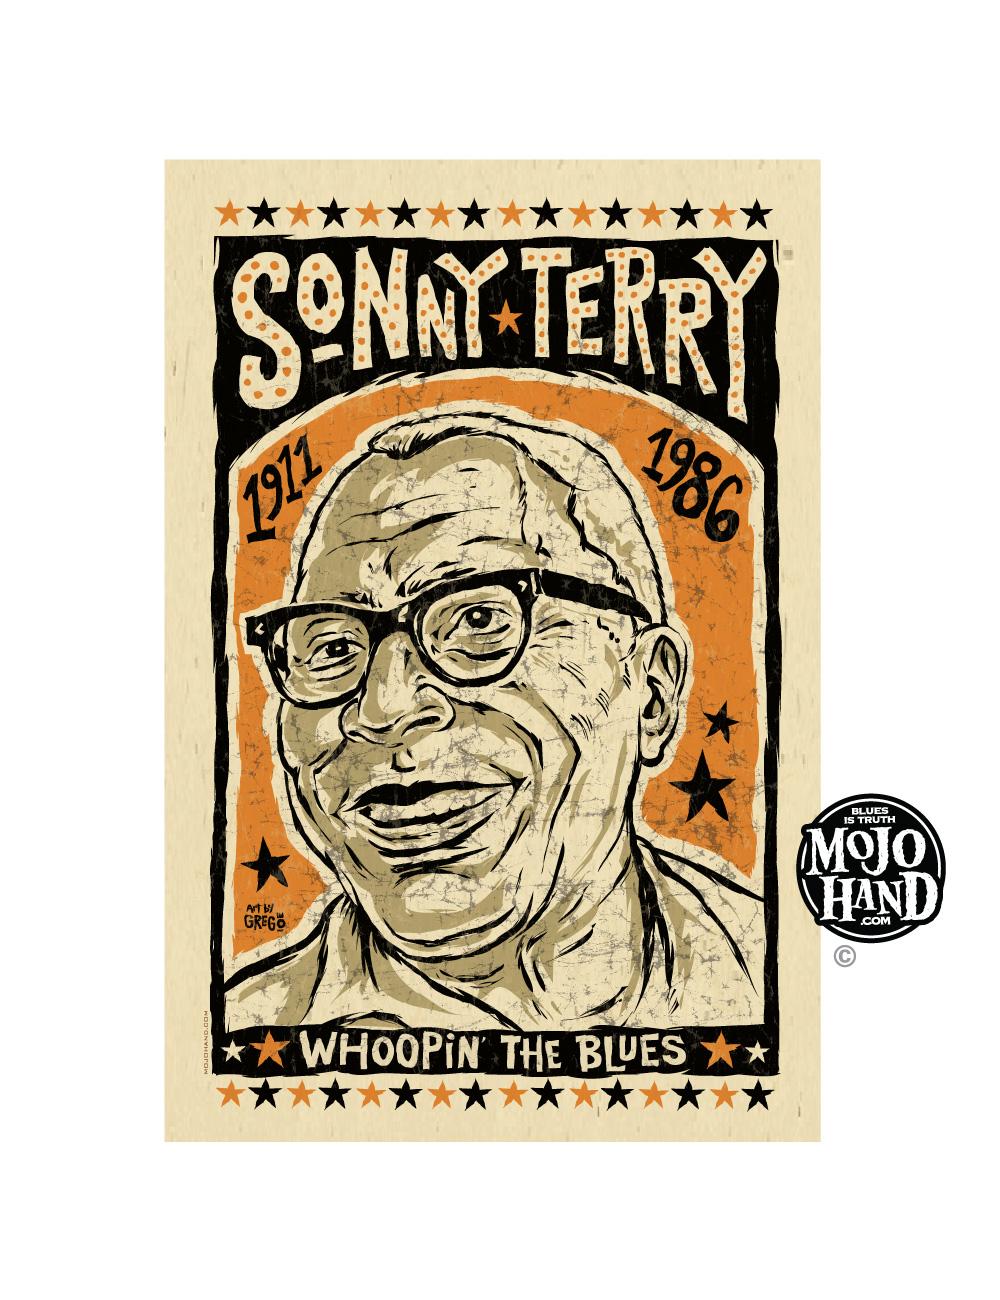 sonny-terry-blues-harmonica-poster-mojohand